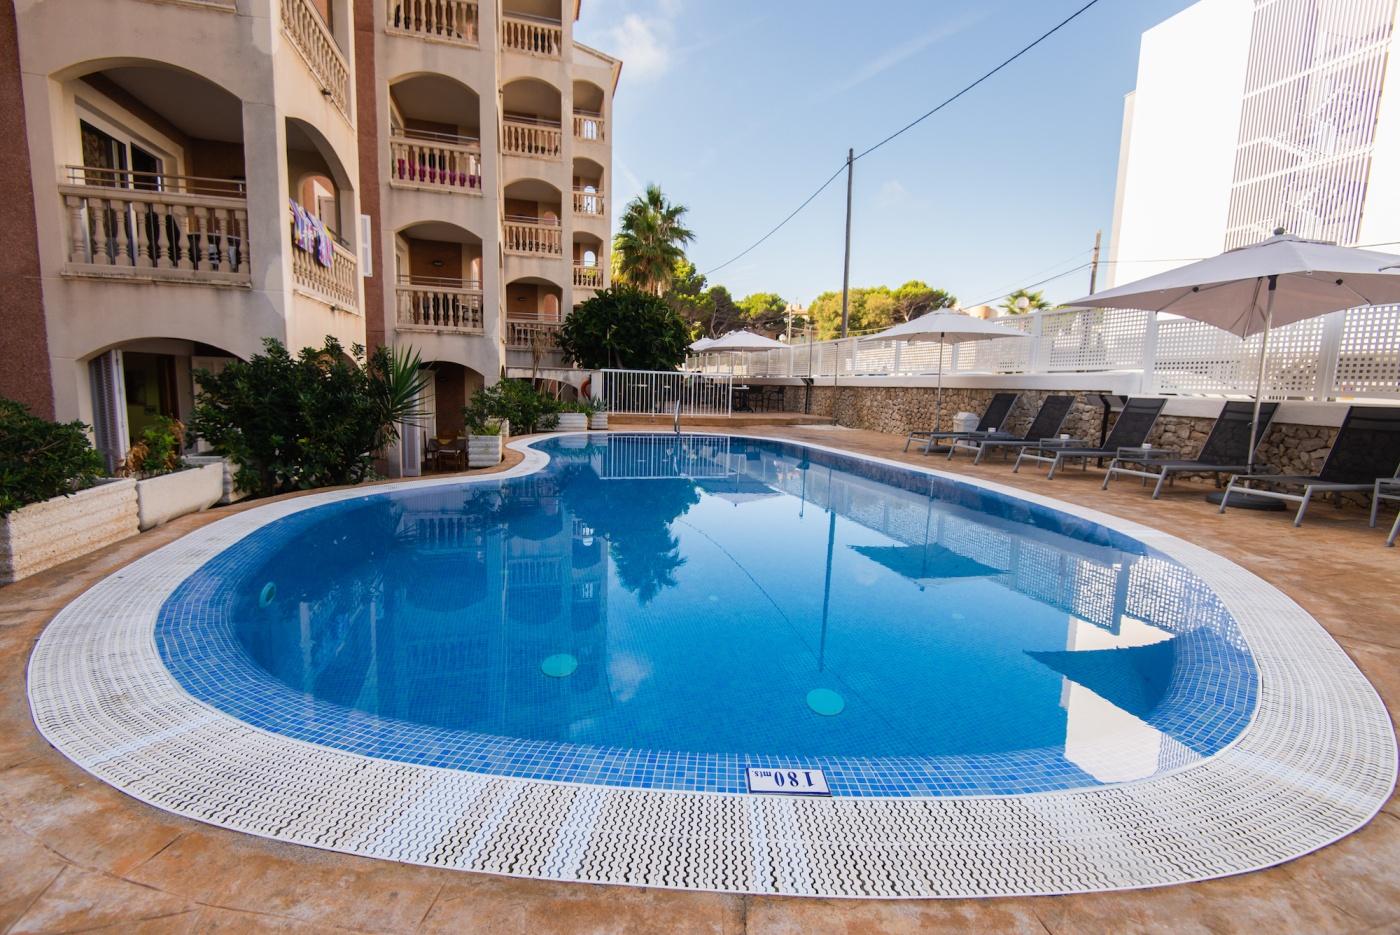 Quijote Apartments Swimming Pool